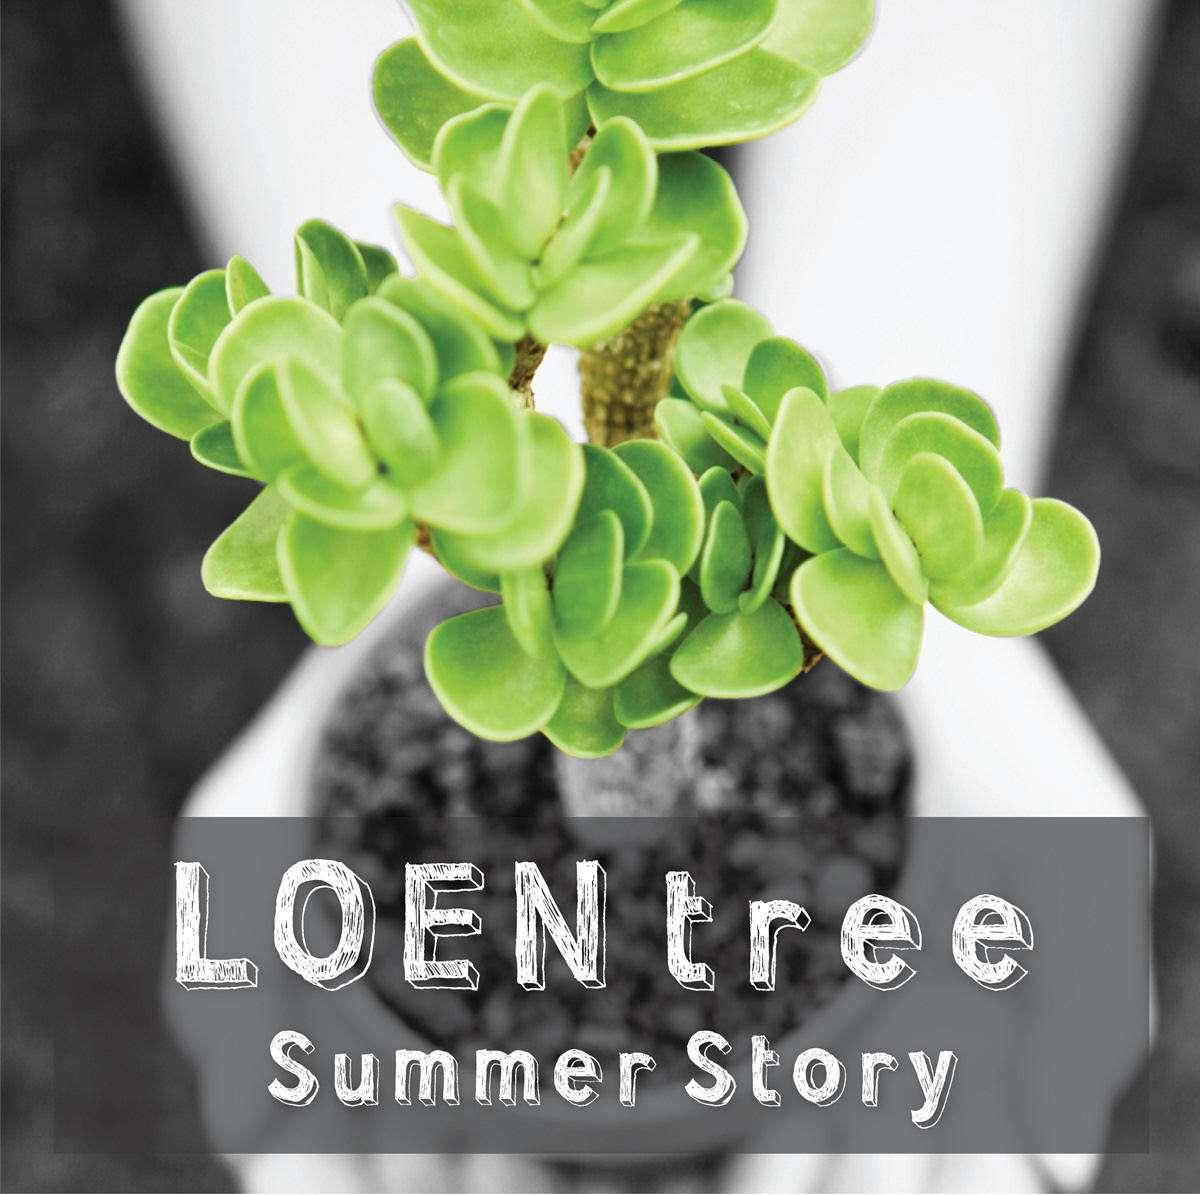 [Single] IU & FIESTA - LOEN TREE Summer Story